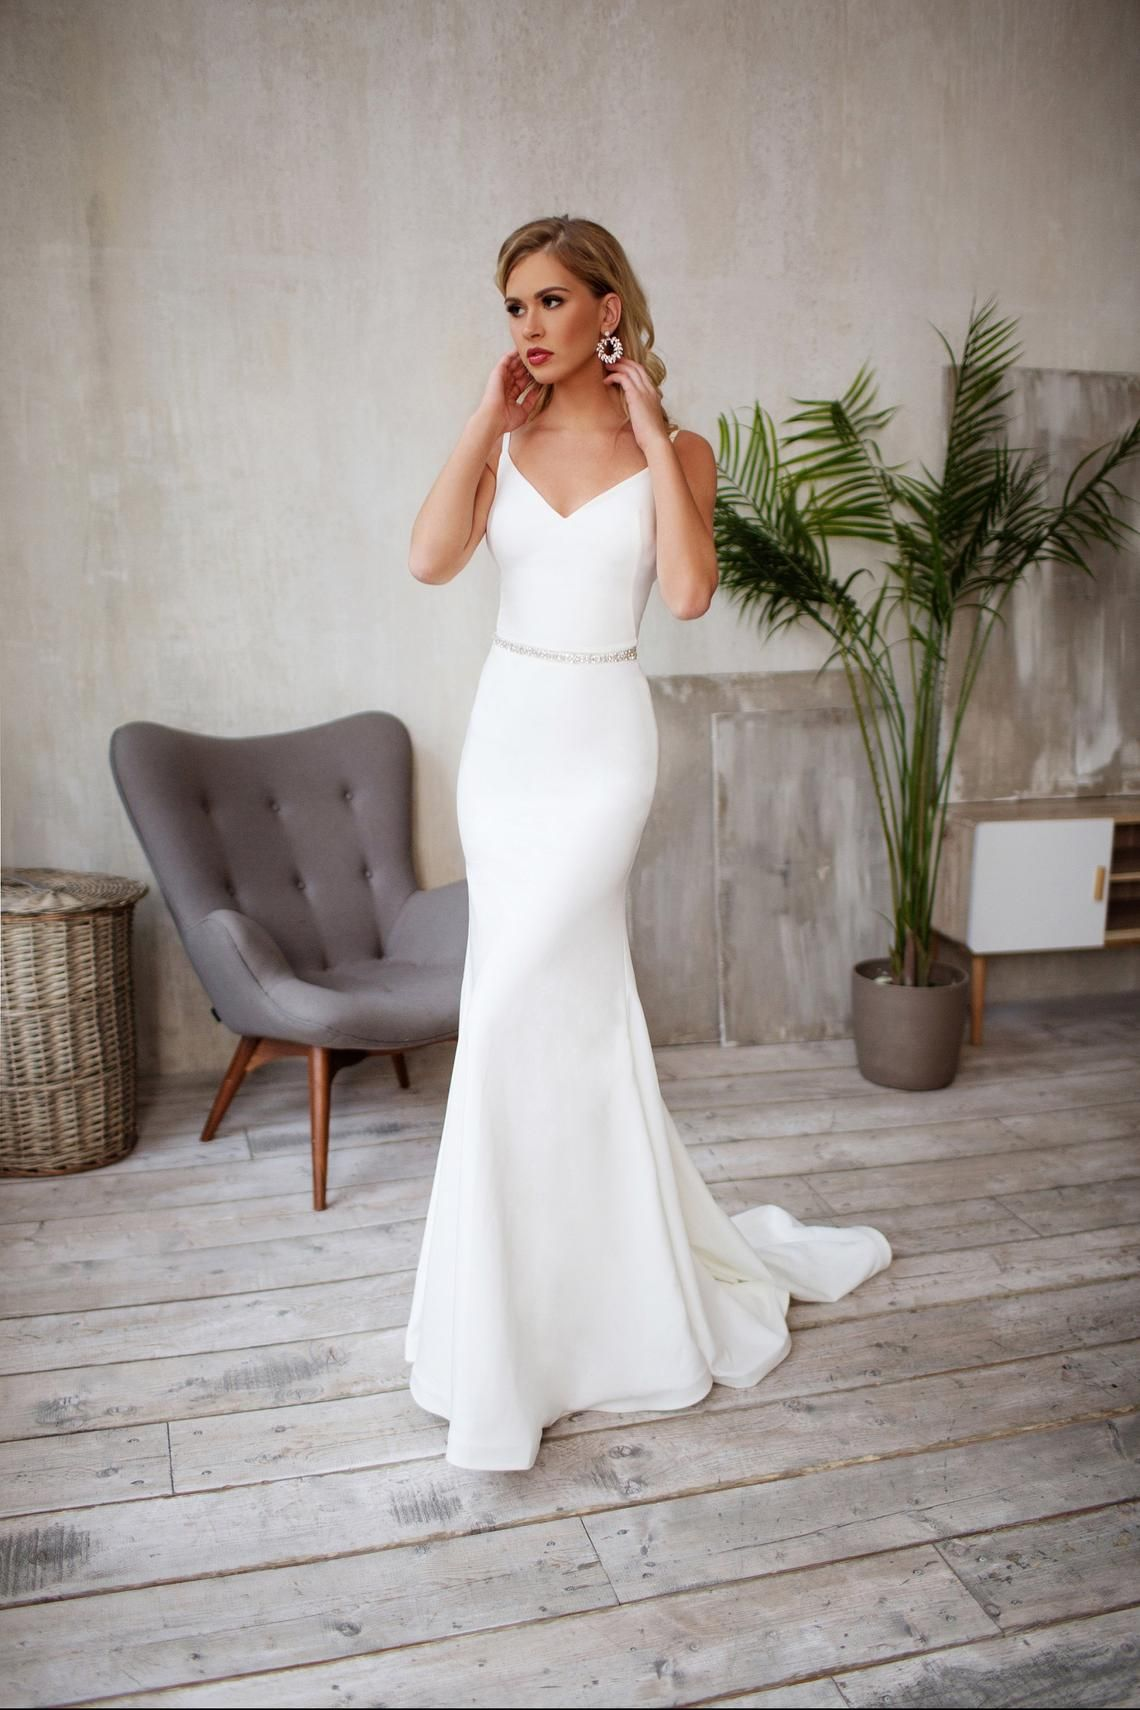 Tight Wedding Dress Crepe Sleek Silhouette Minimalist Bridal Gown Georgie Tight Wedding Dress Bridal Dresses Minimalist Wedding Dresses [ 1710 x 1140 Pixel ]